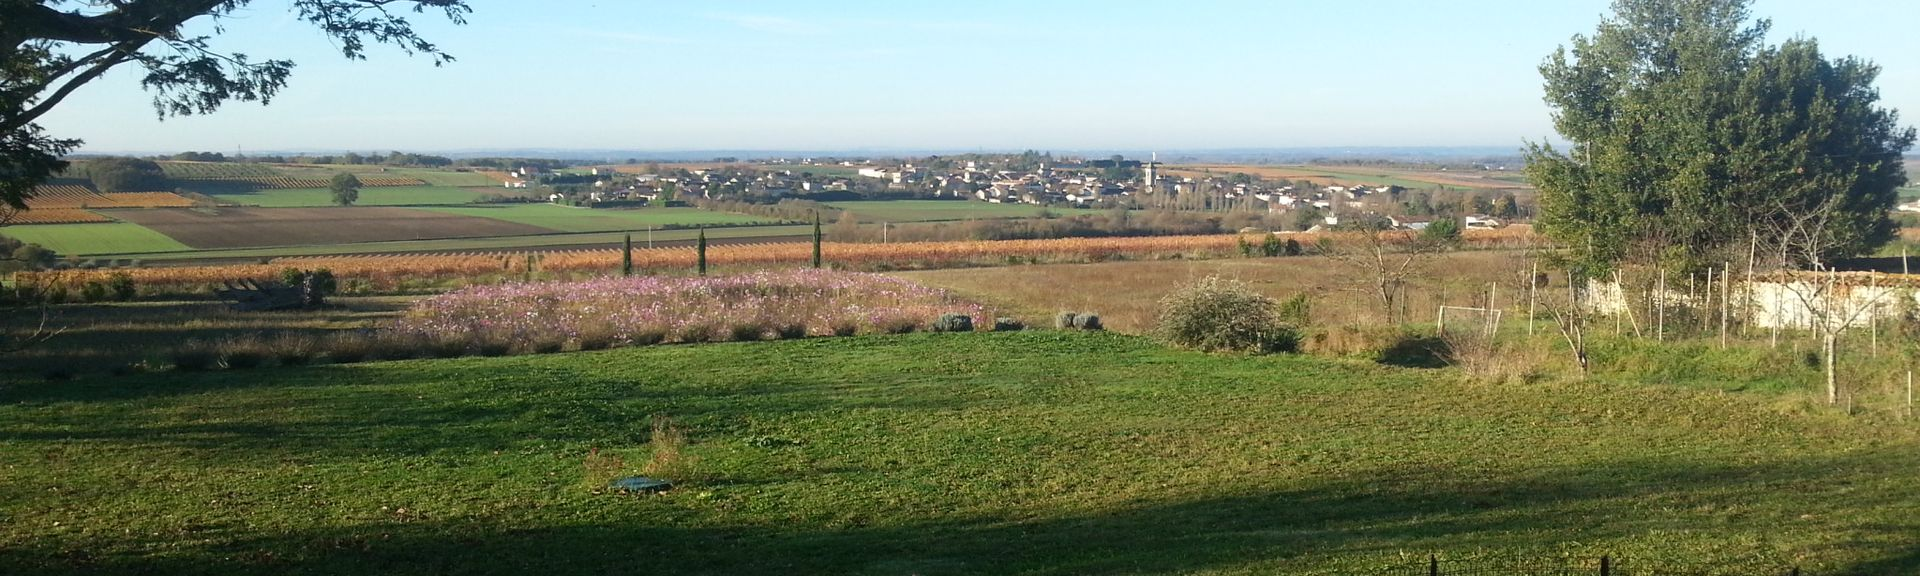 Matha, Charente-Maritime (område), Frankrike